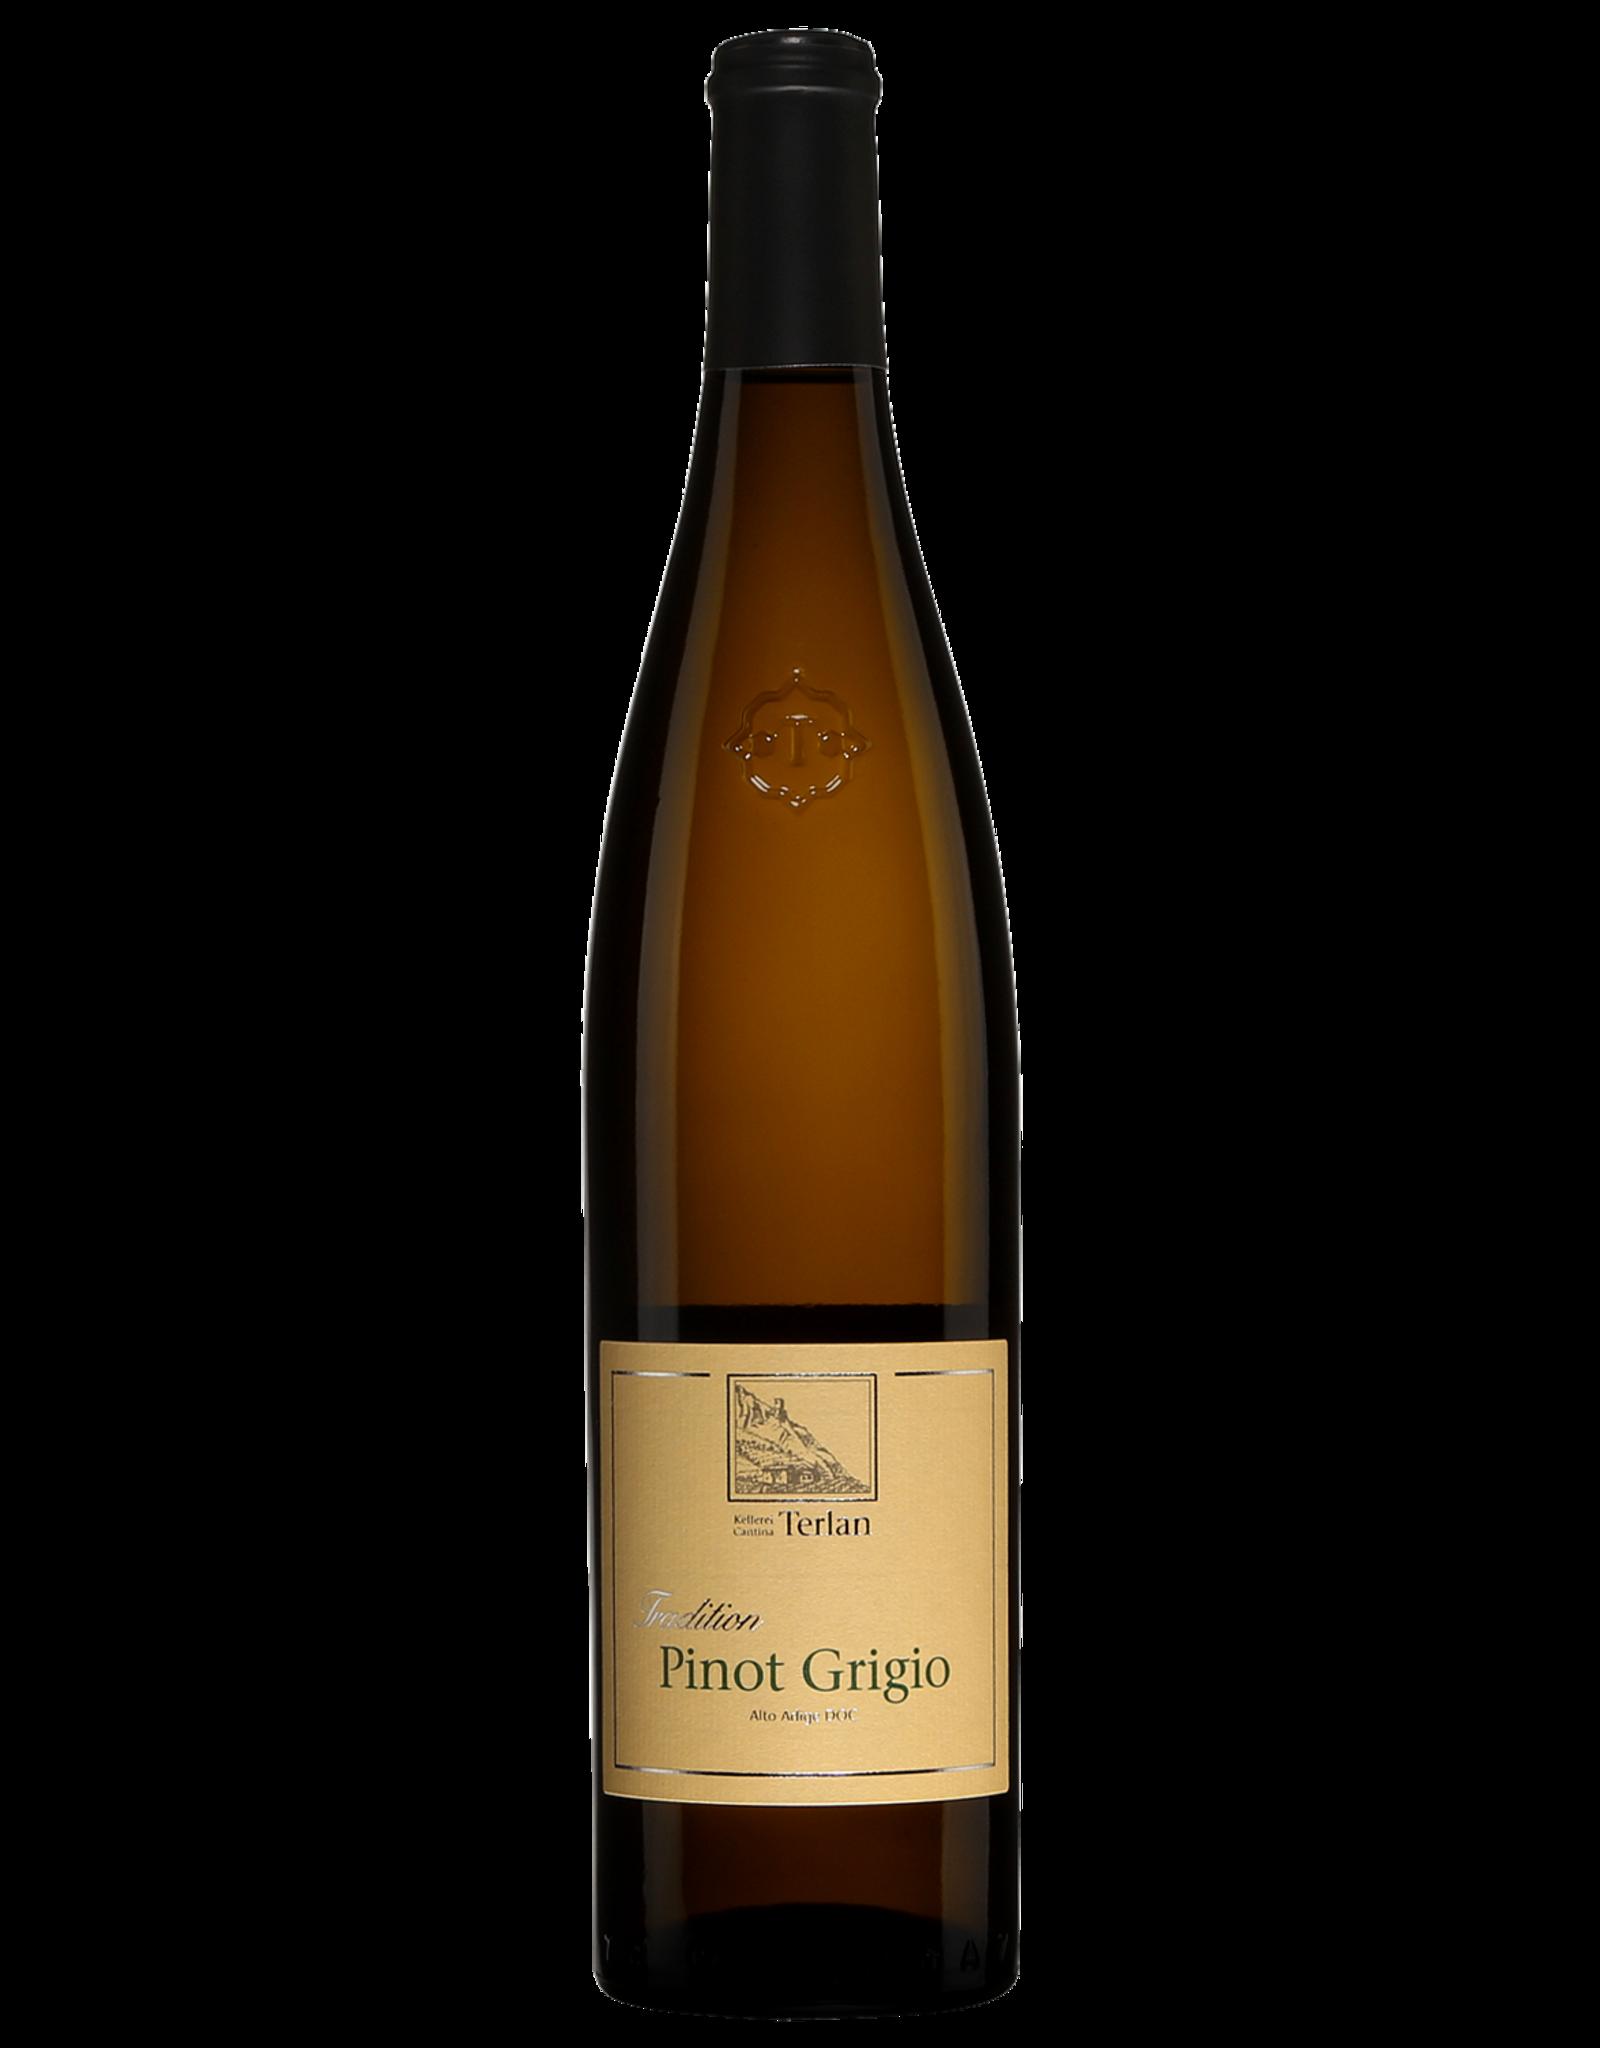 Terlano Pinot Grigio Alto Adige 2018